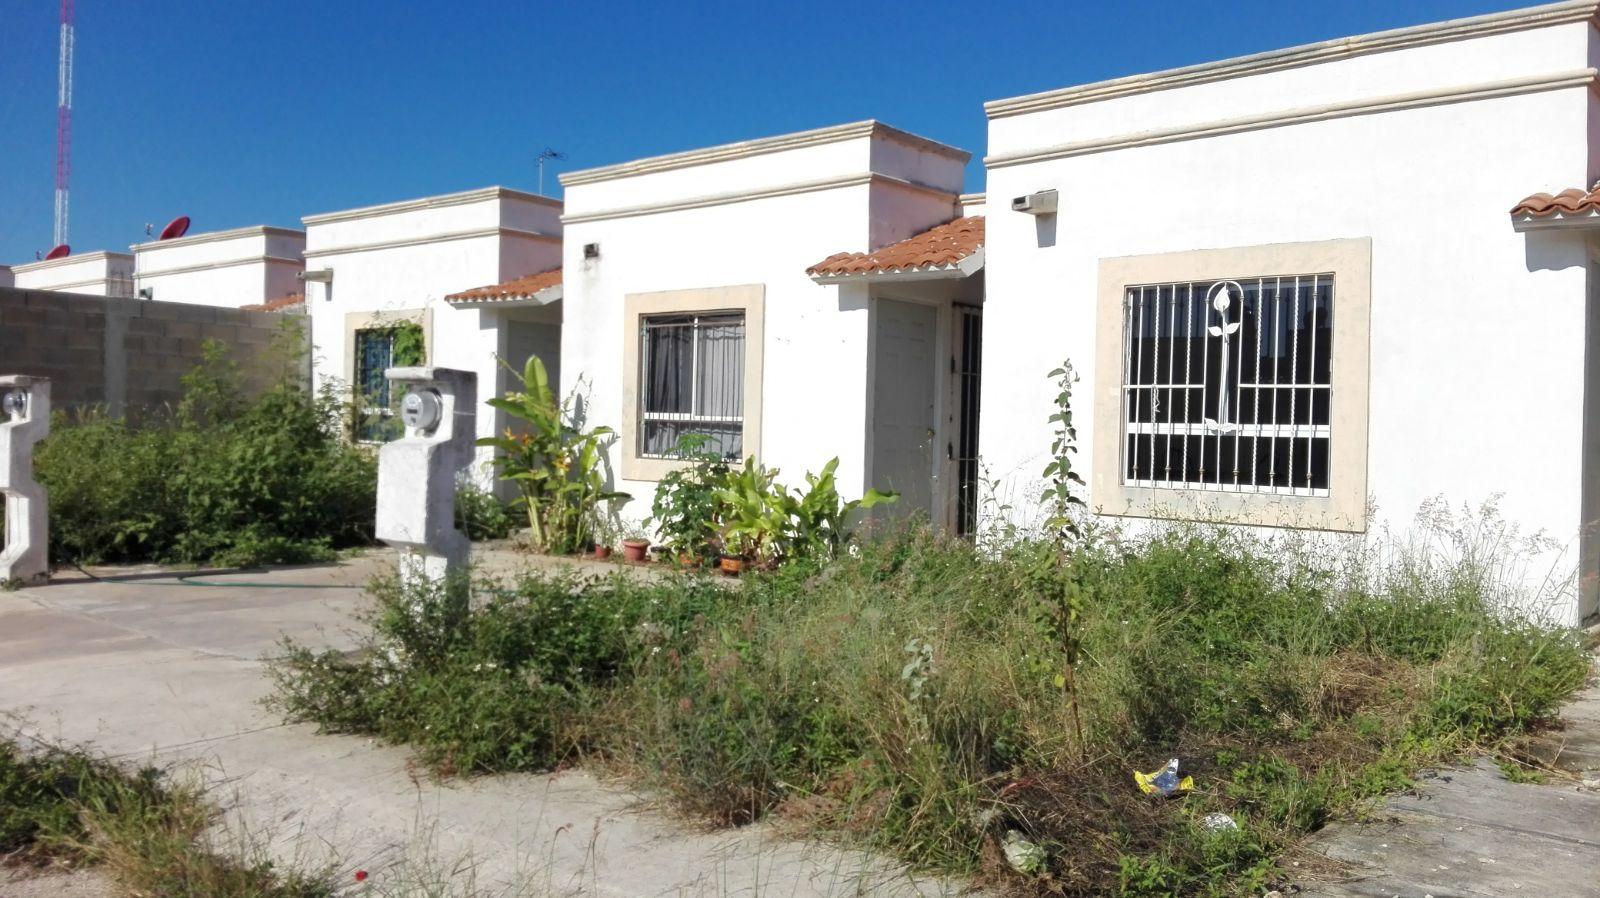 Perfilan en Mérida 'tirar' propuesta de minicasas